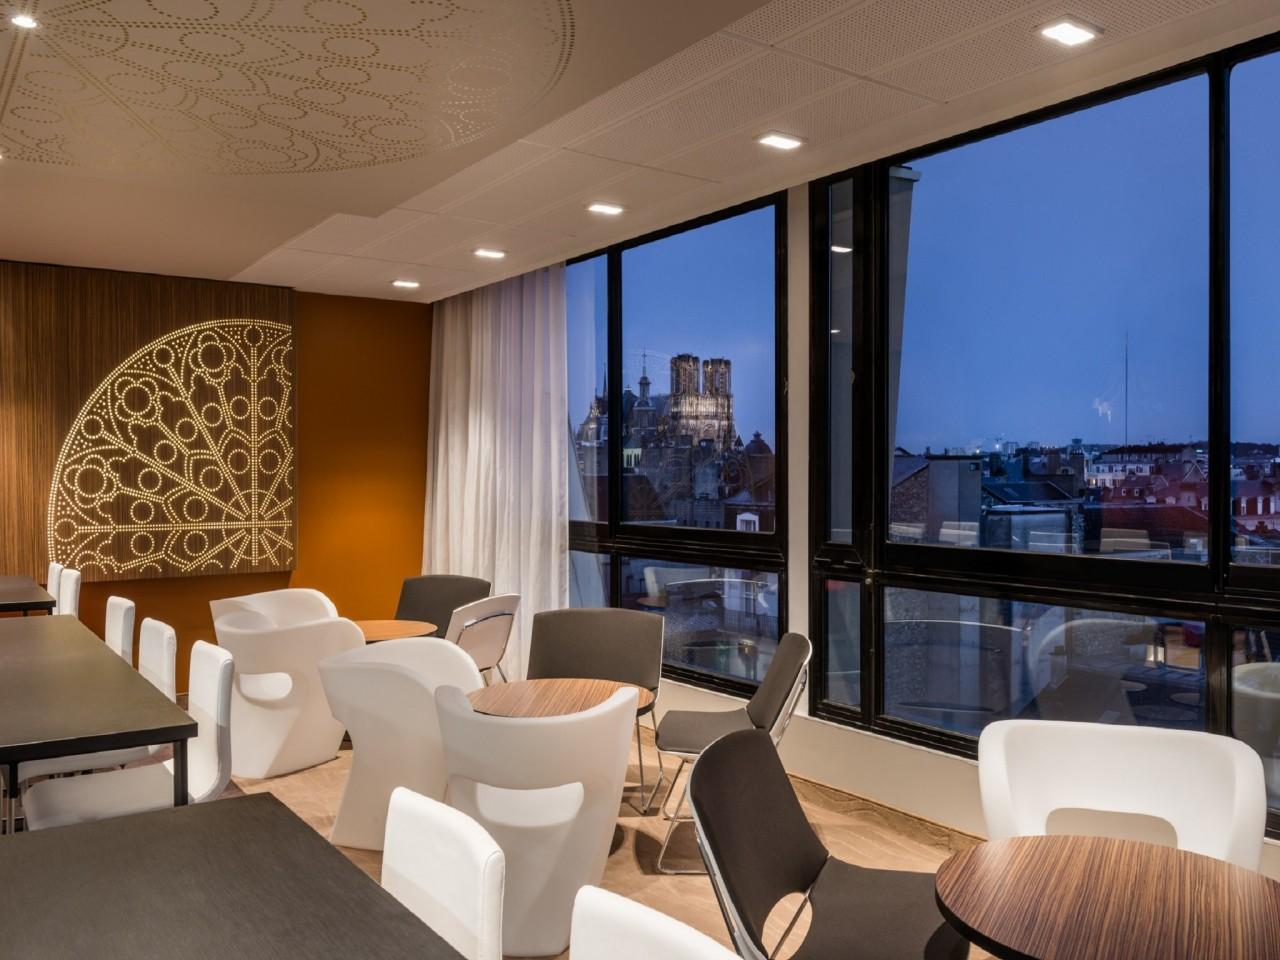 Holiday Inn REIMS CITY CENTRE Reims Hotel Bar 3 1280x1280